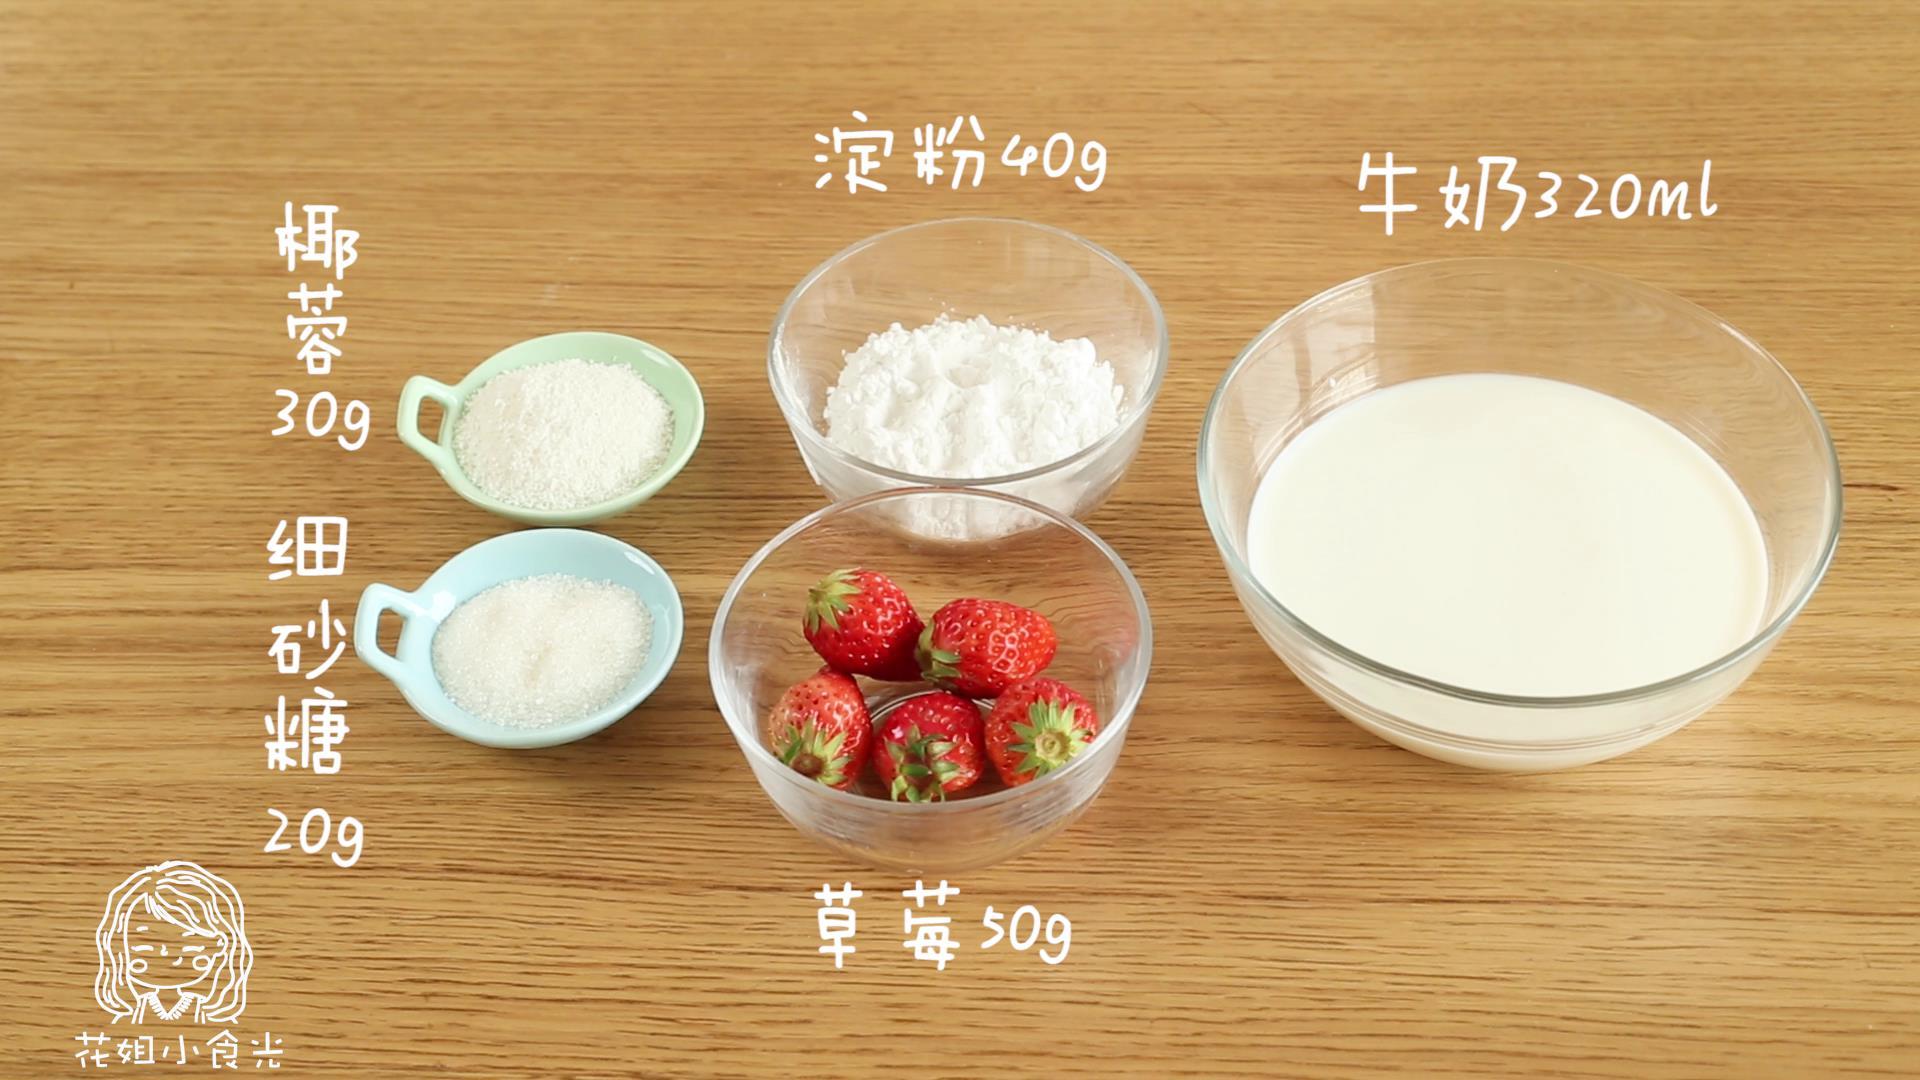 12m+草莓小方,食材准备~</p> <p>